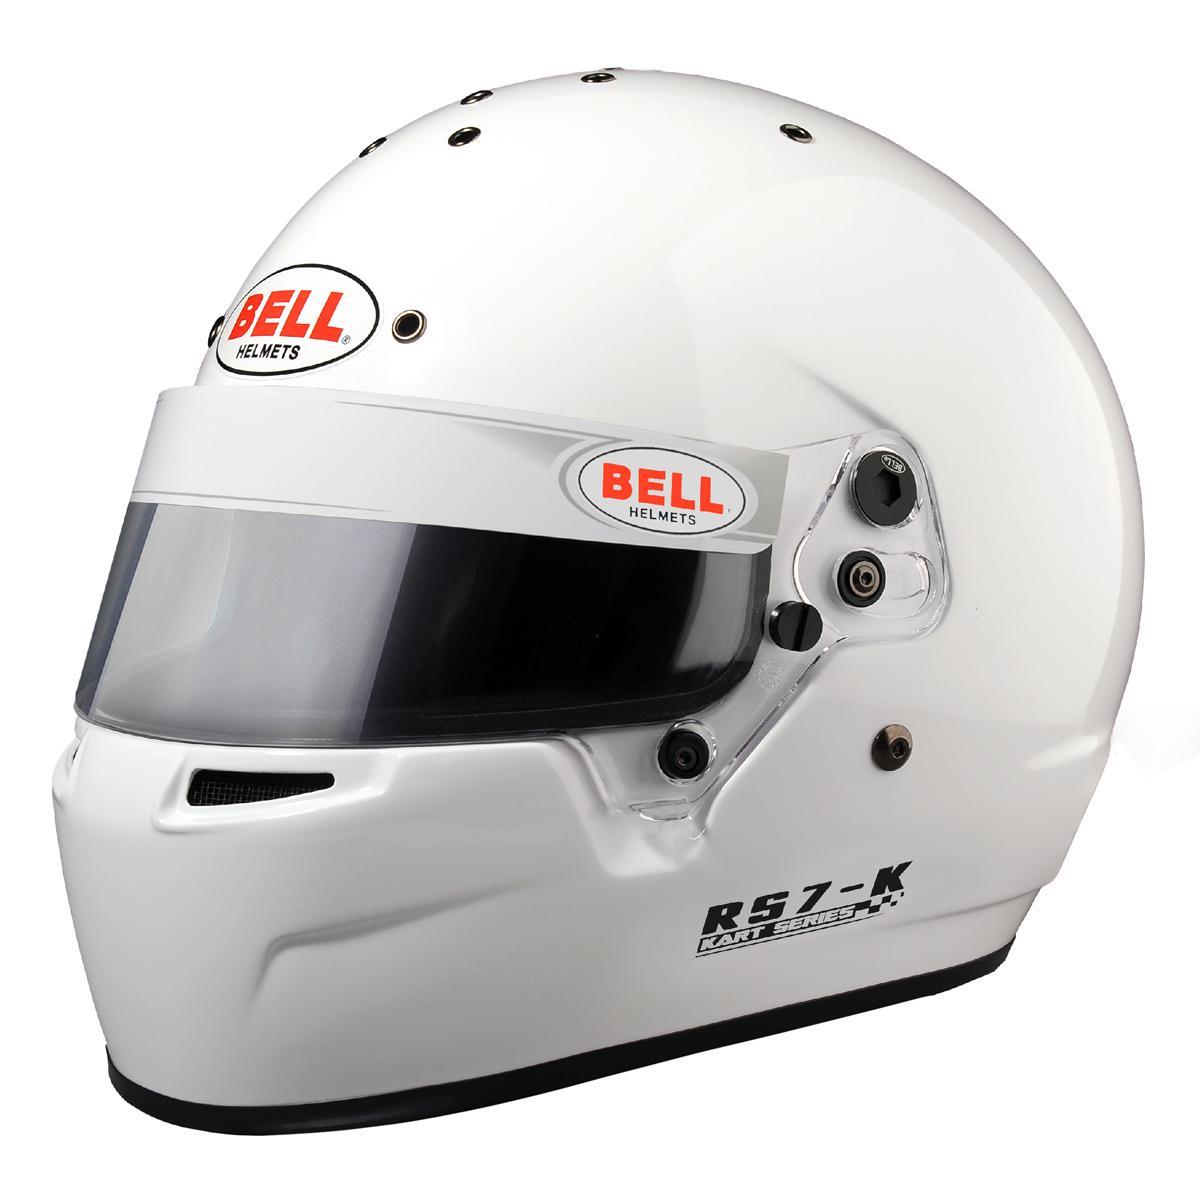 05999d93 Bell RS3 K Kart Racing Helmet in White from Merlin Motorsport